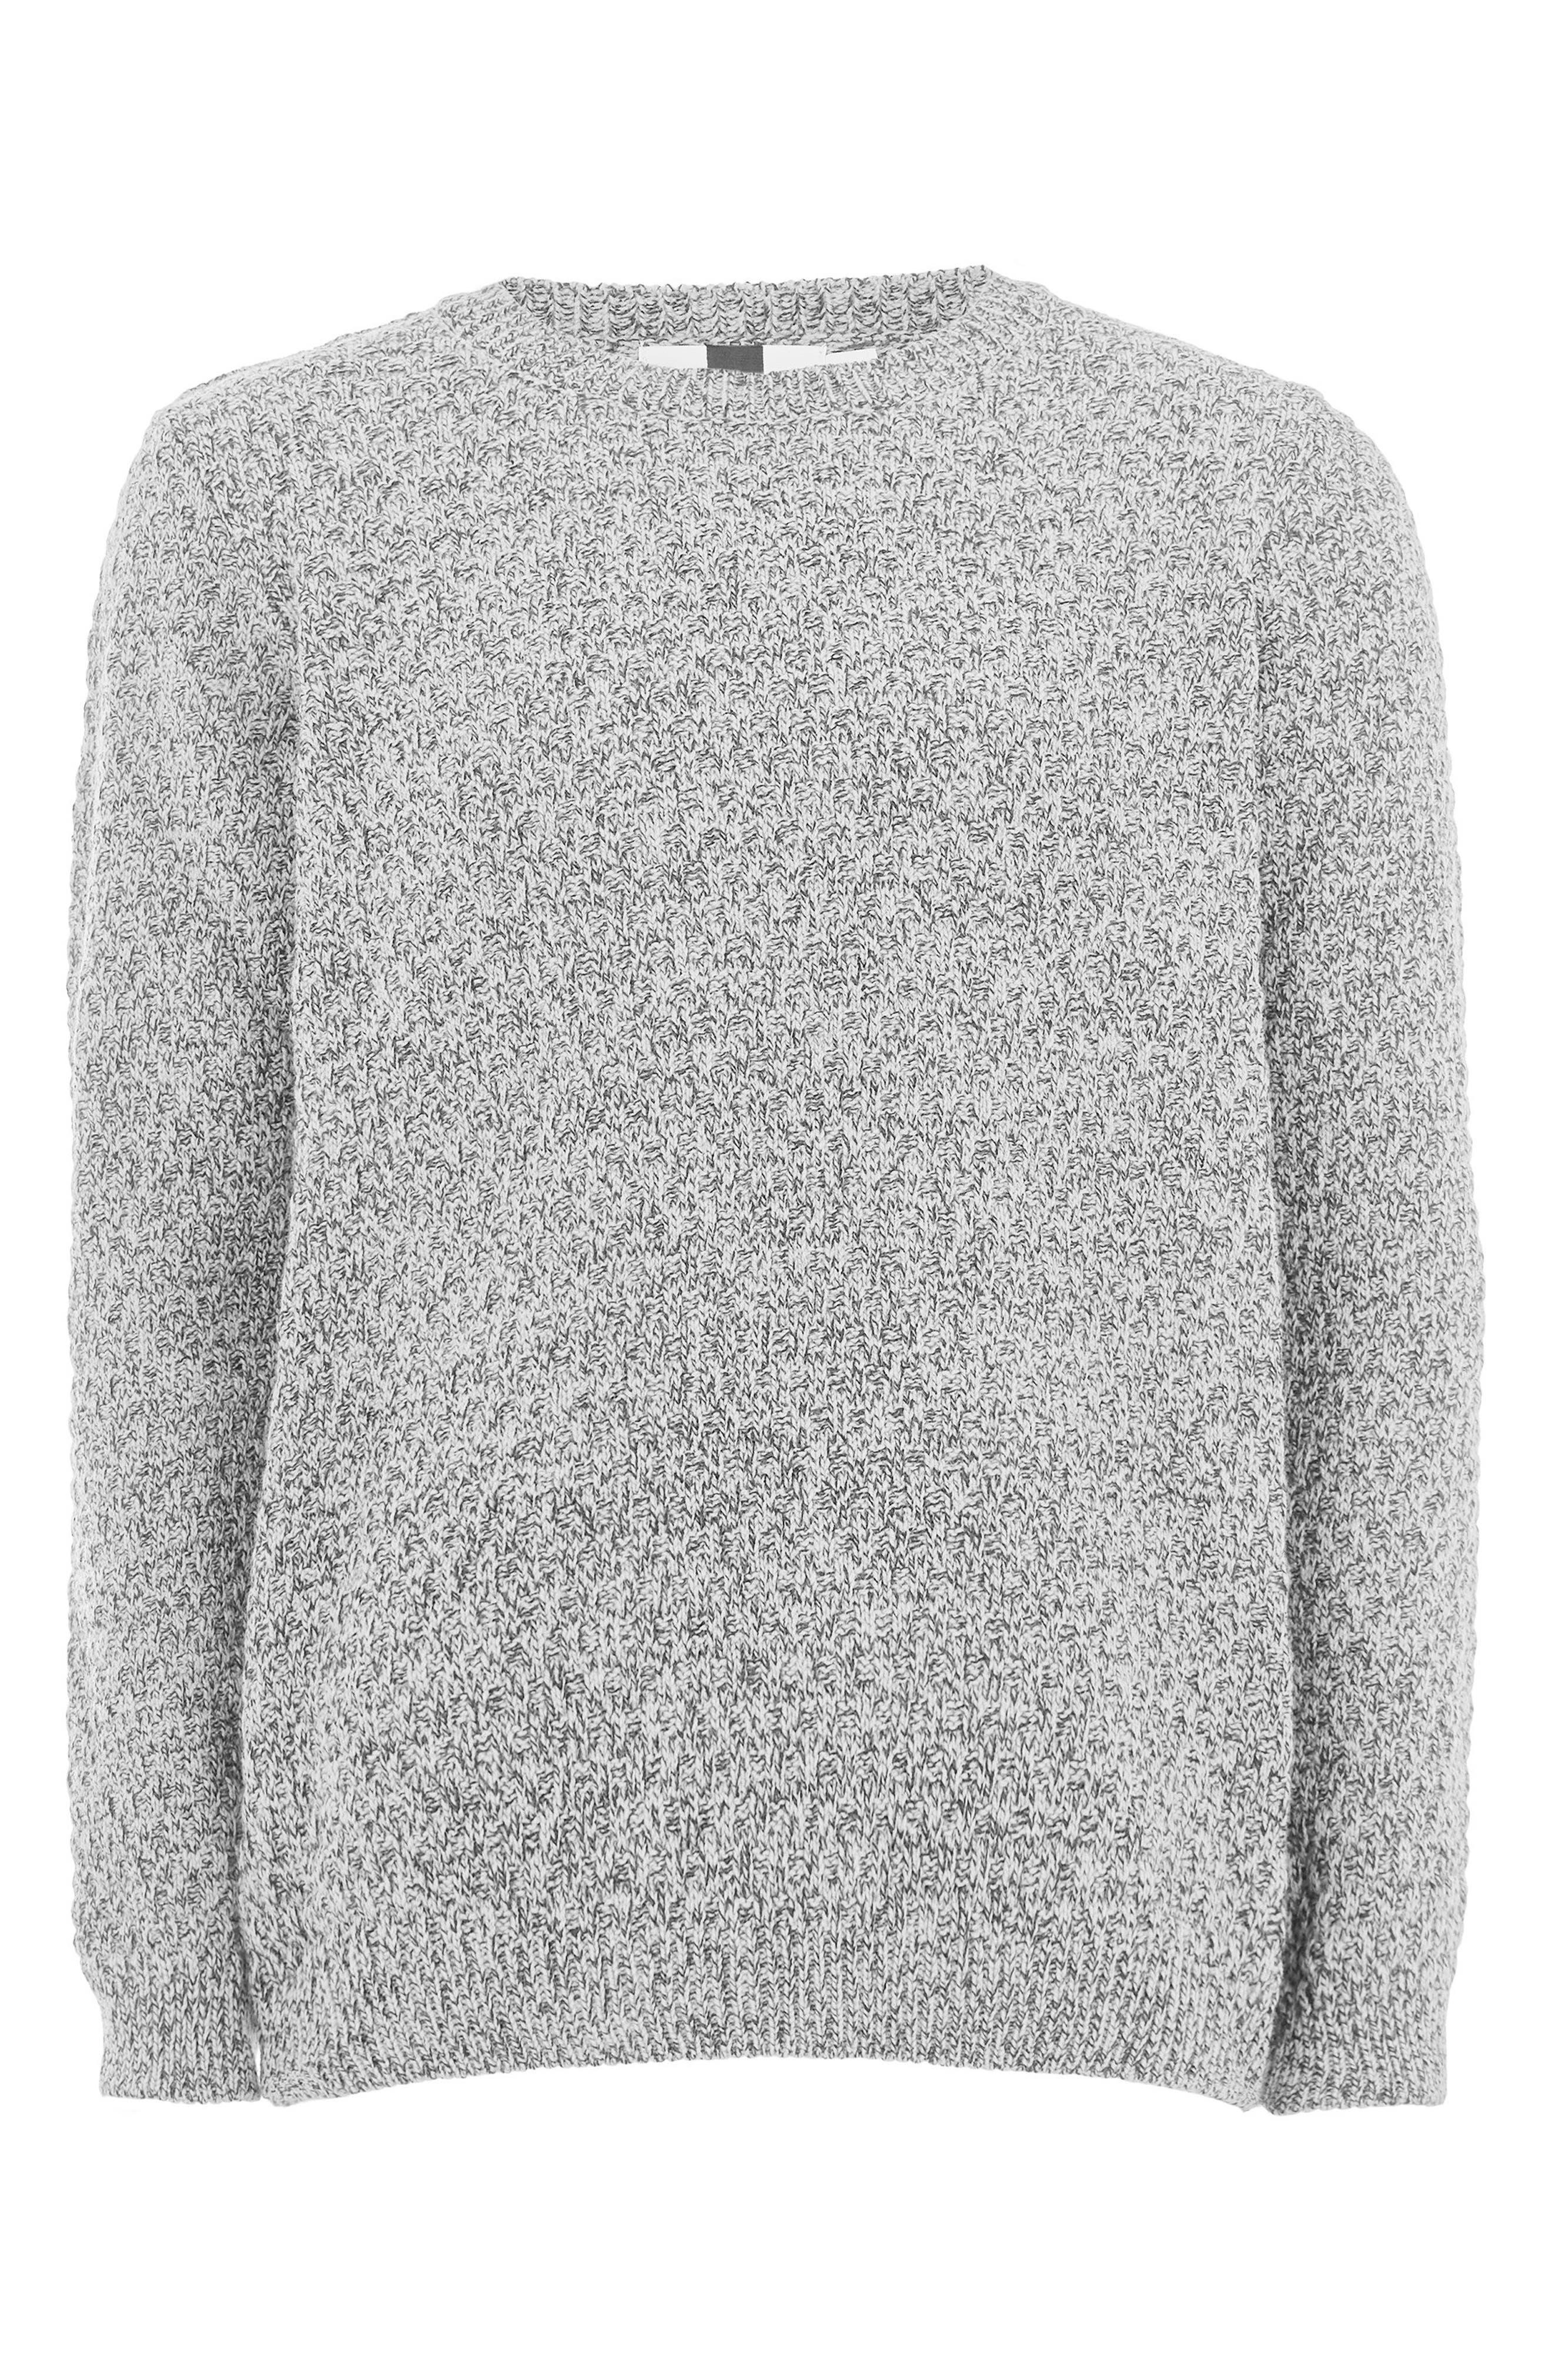 Textured Crewneck Sweater,                             Alternate thumbnail 4, color,                             GREY